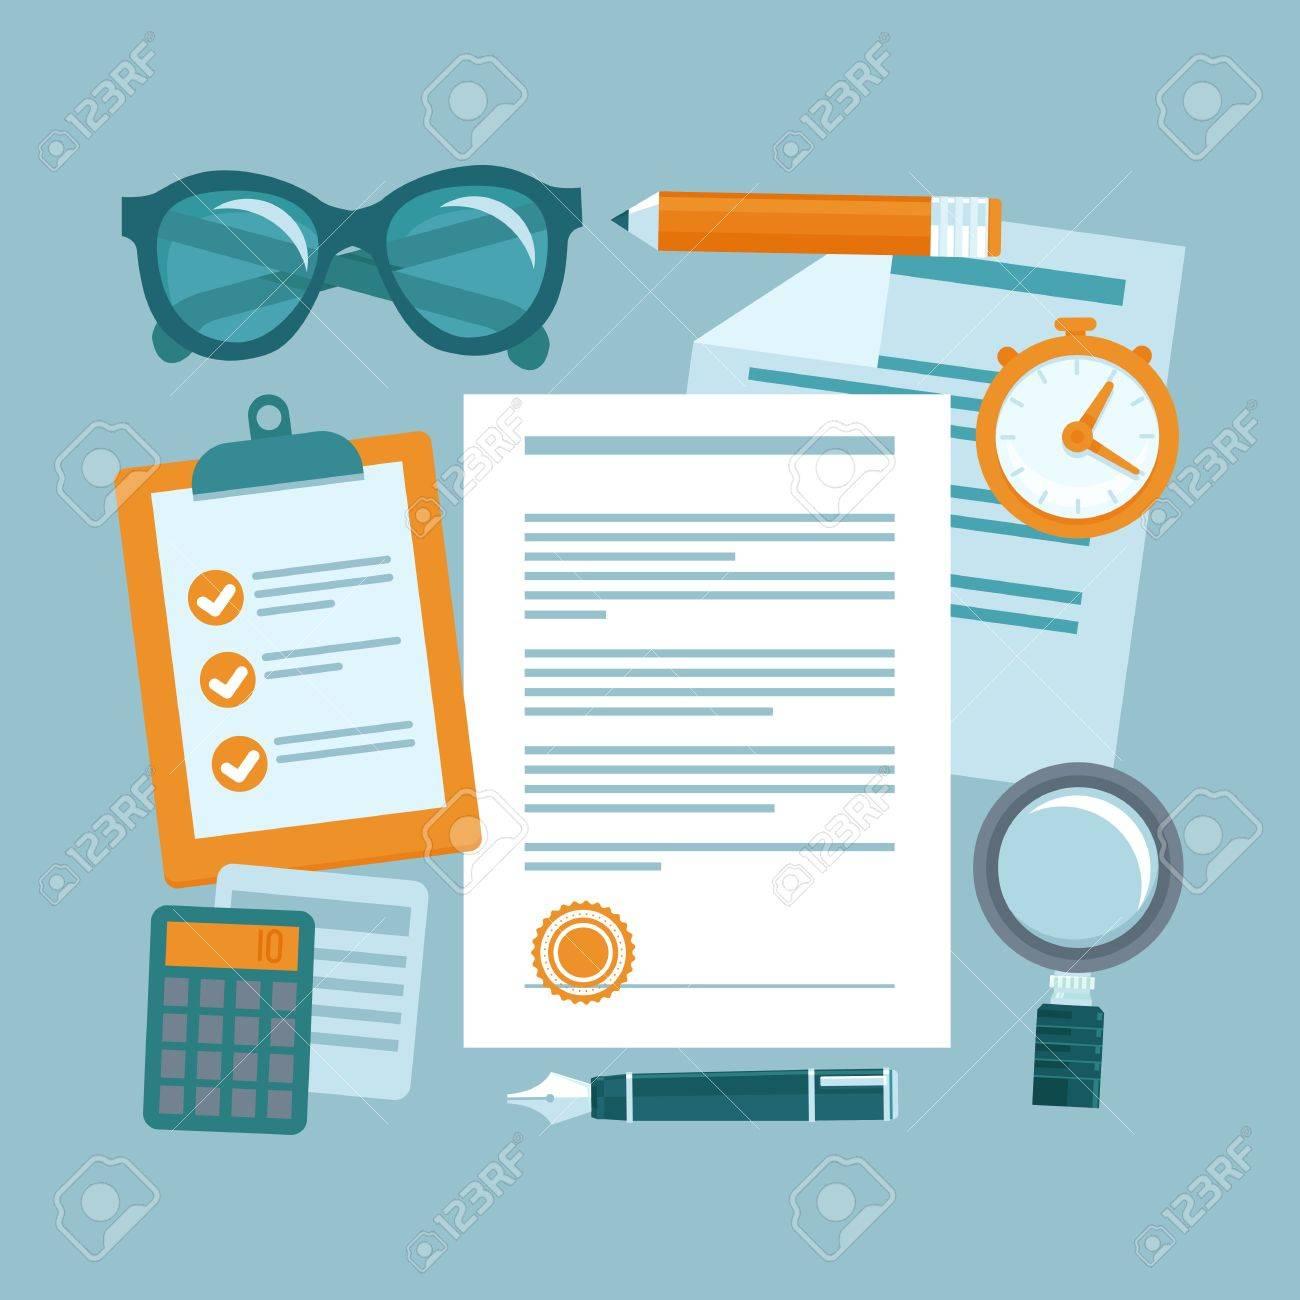 Paper on management